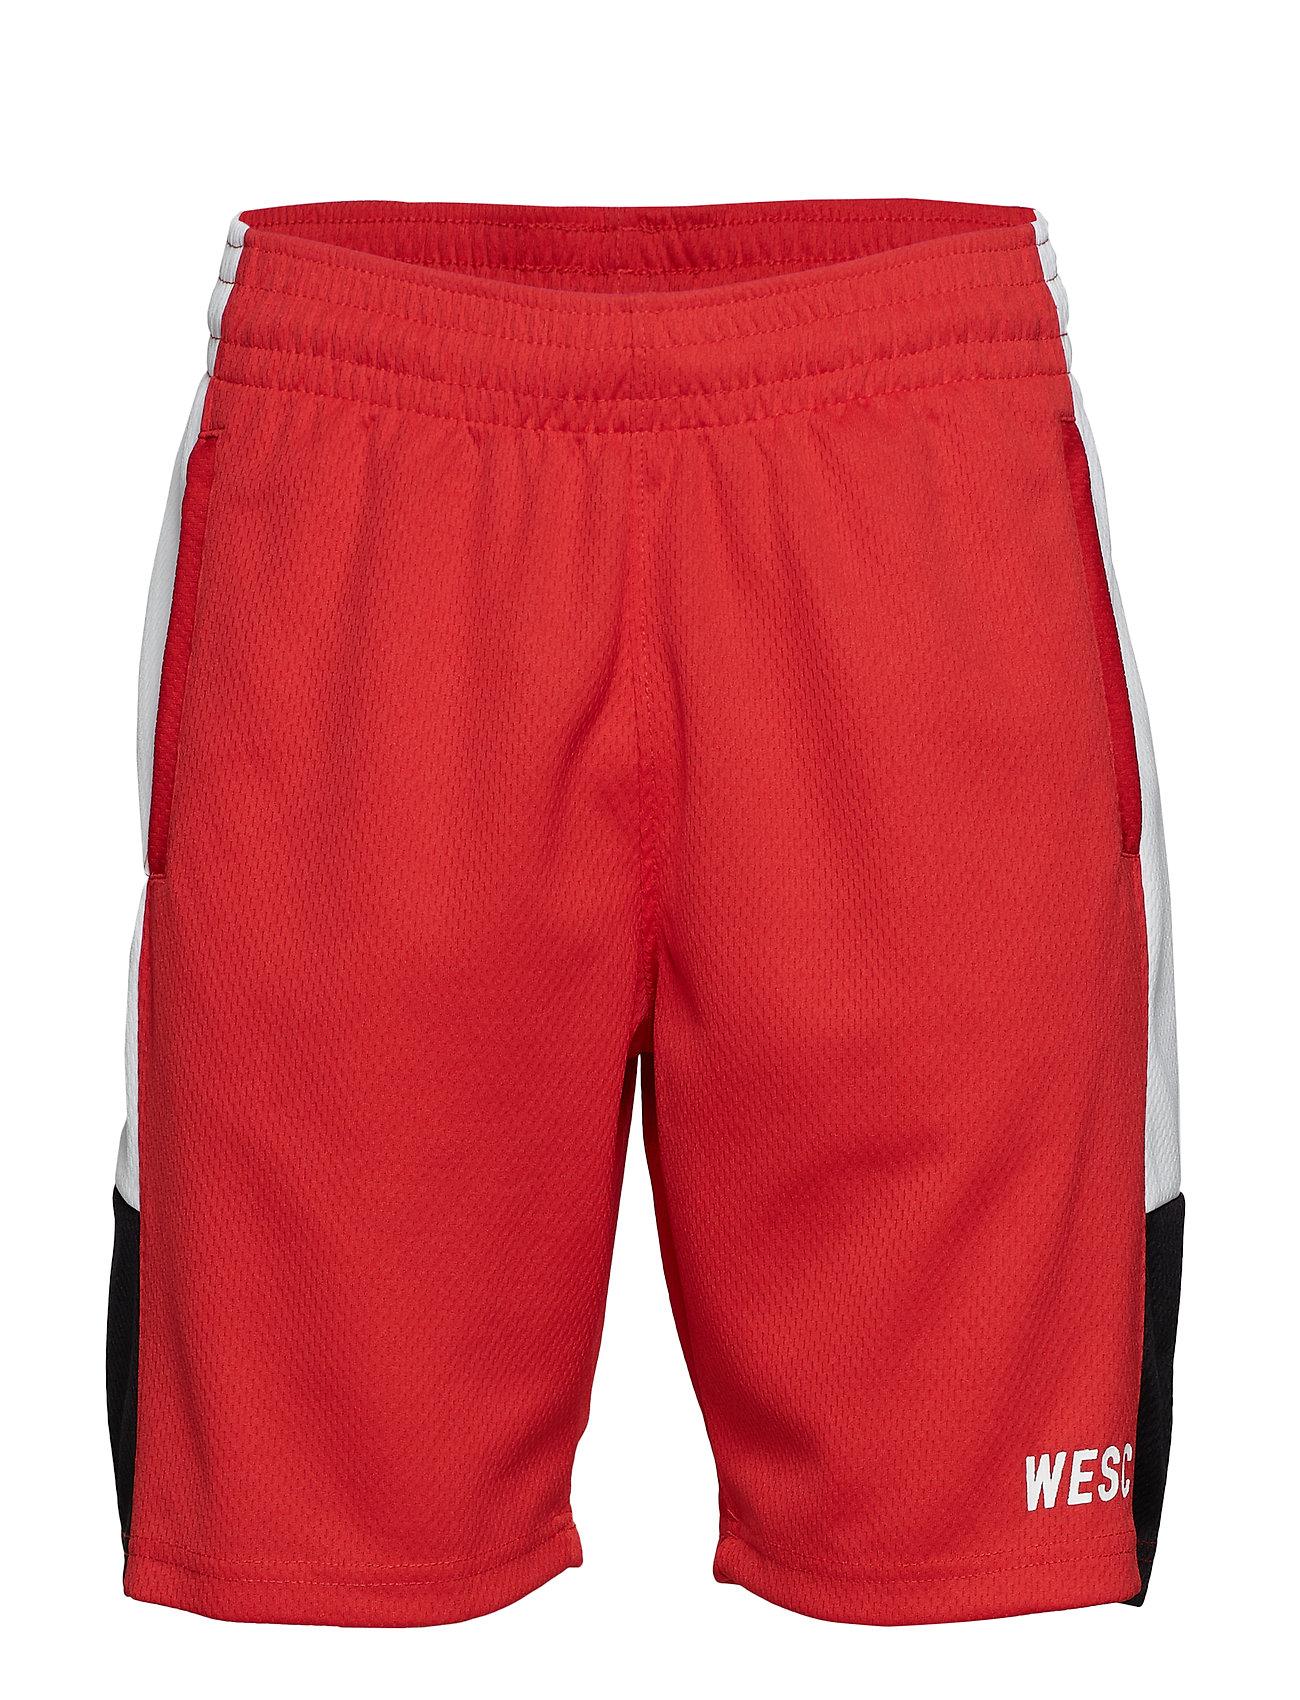 WeSC B-BALL SHORTS - BLOOD RED